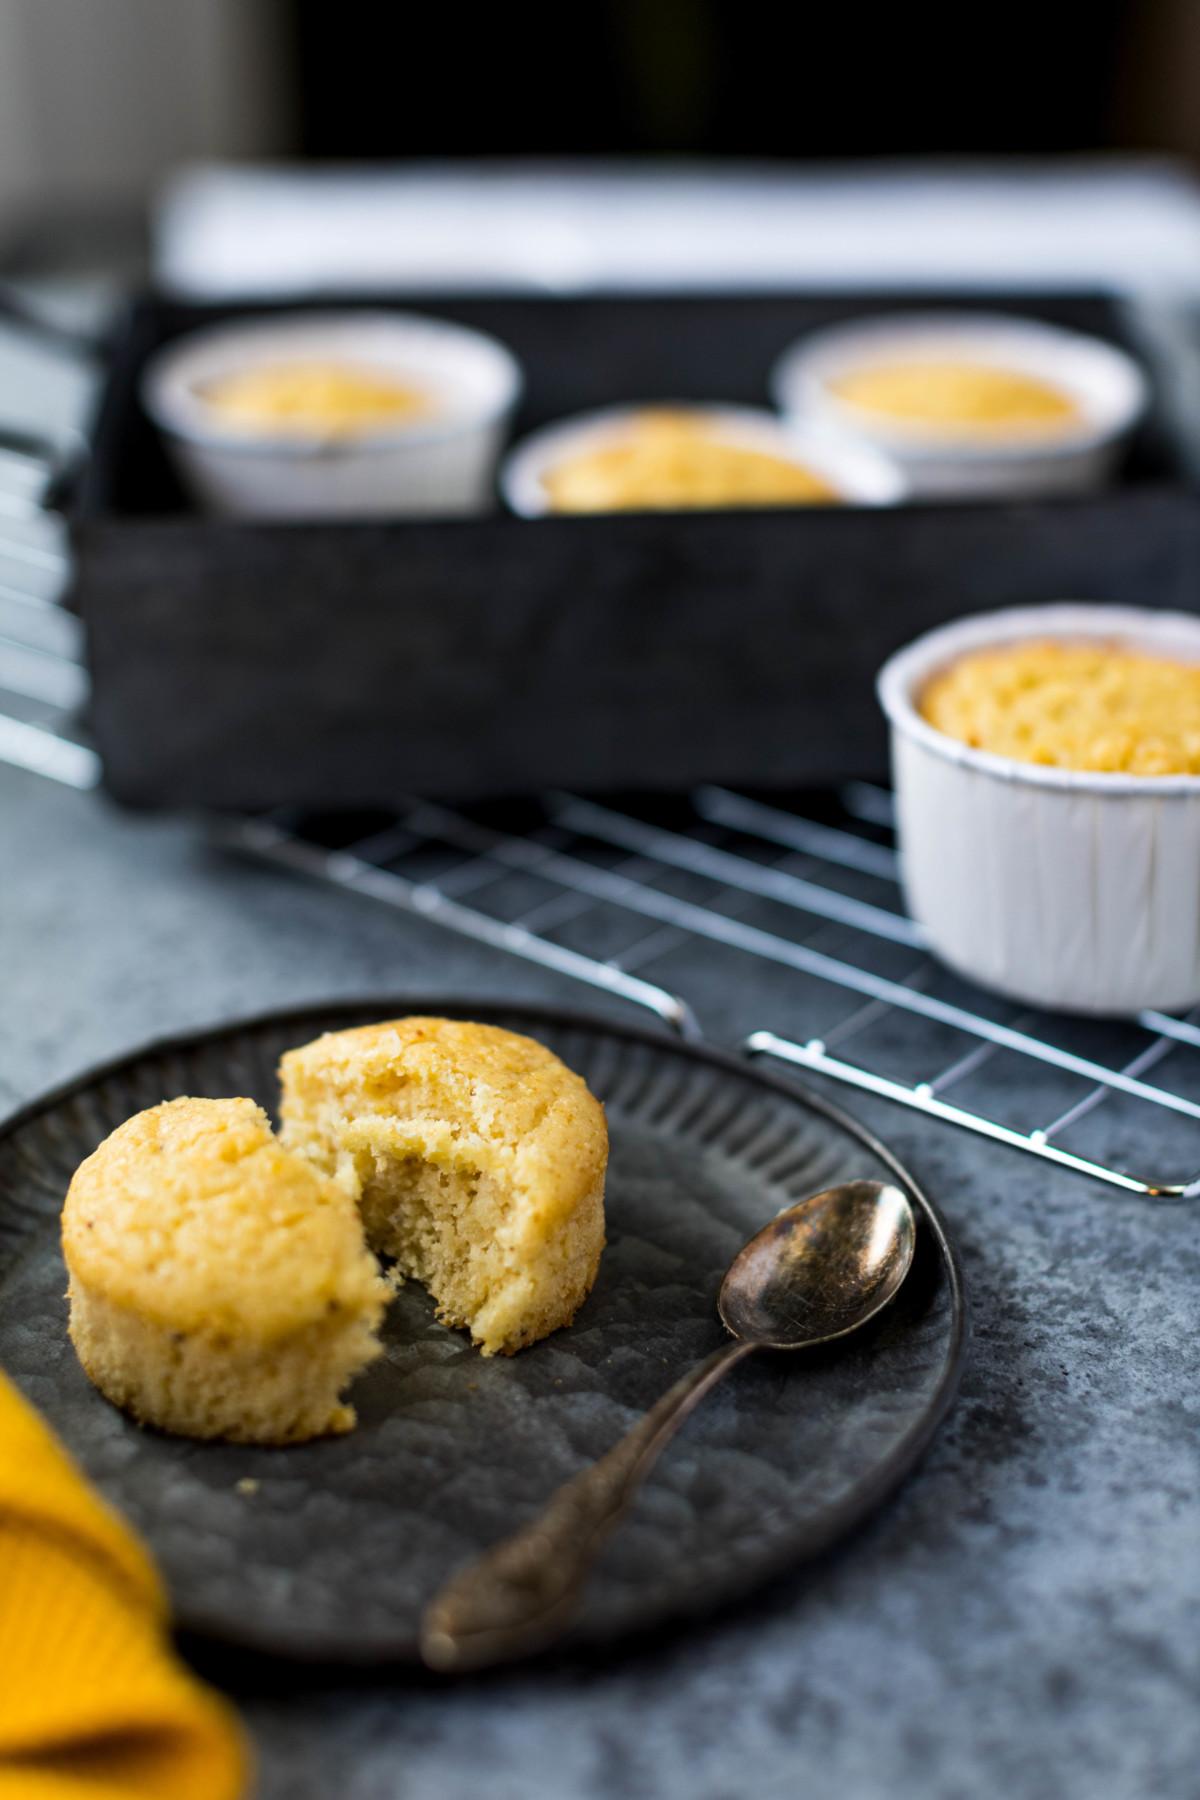 Zitronen-Mohn-Muffins // White Poppy Seed and Lemon Muffins by https://babyrockmyday.com/zitronen-mohn-muffins/